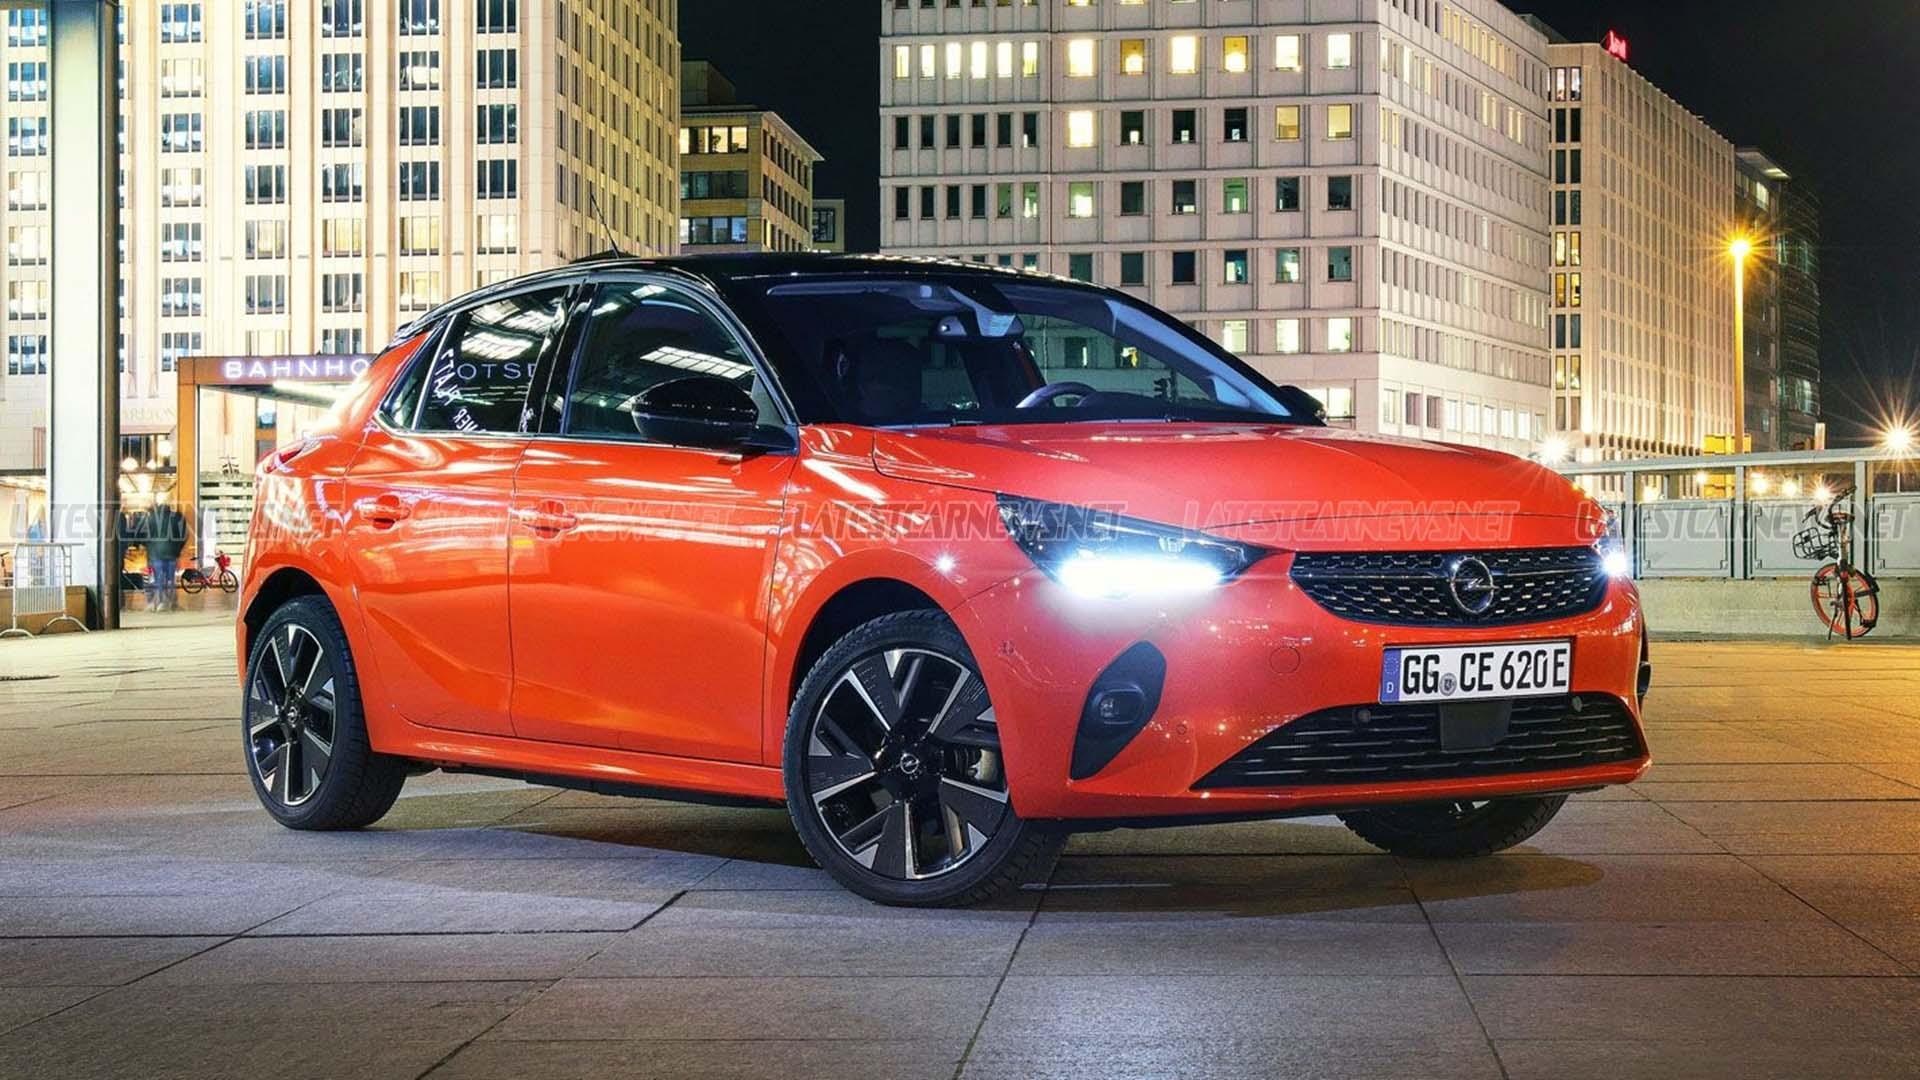 Opel Corsa Interior 2021 Collections | IASL Auto